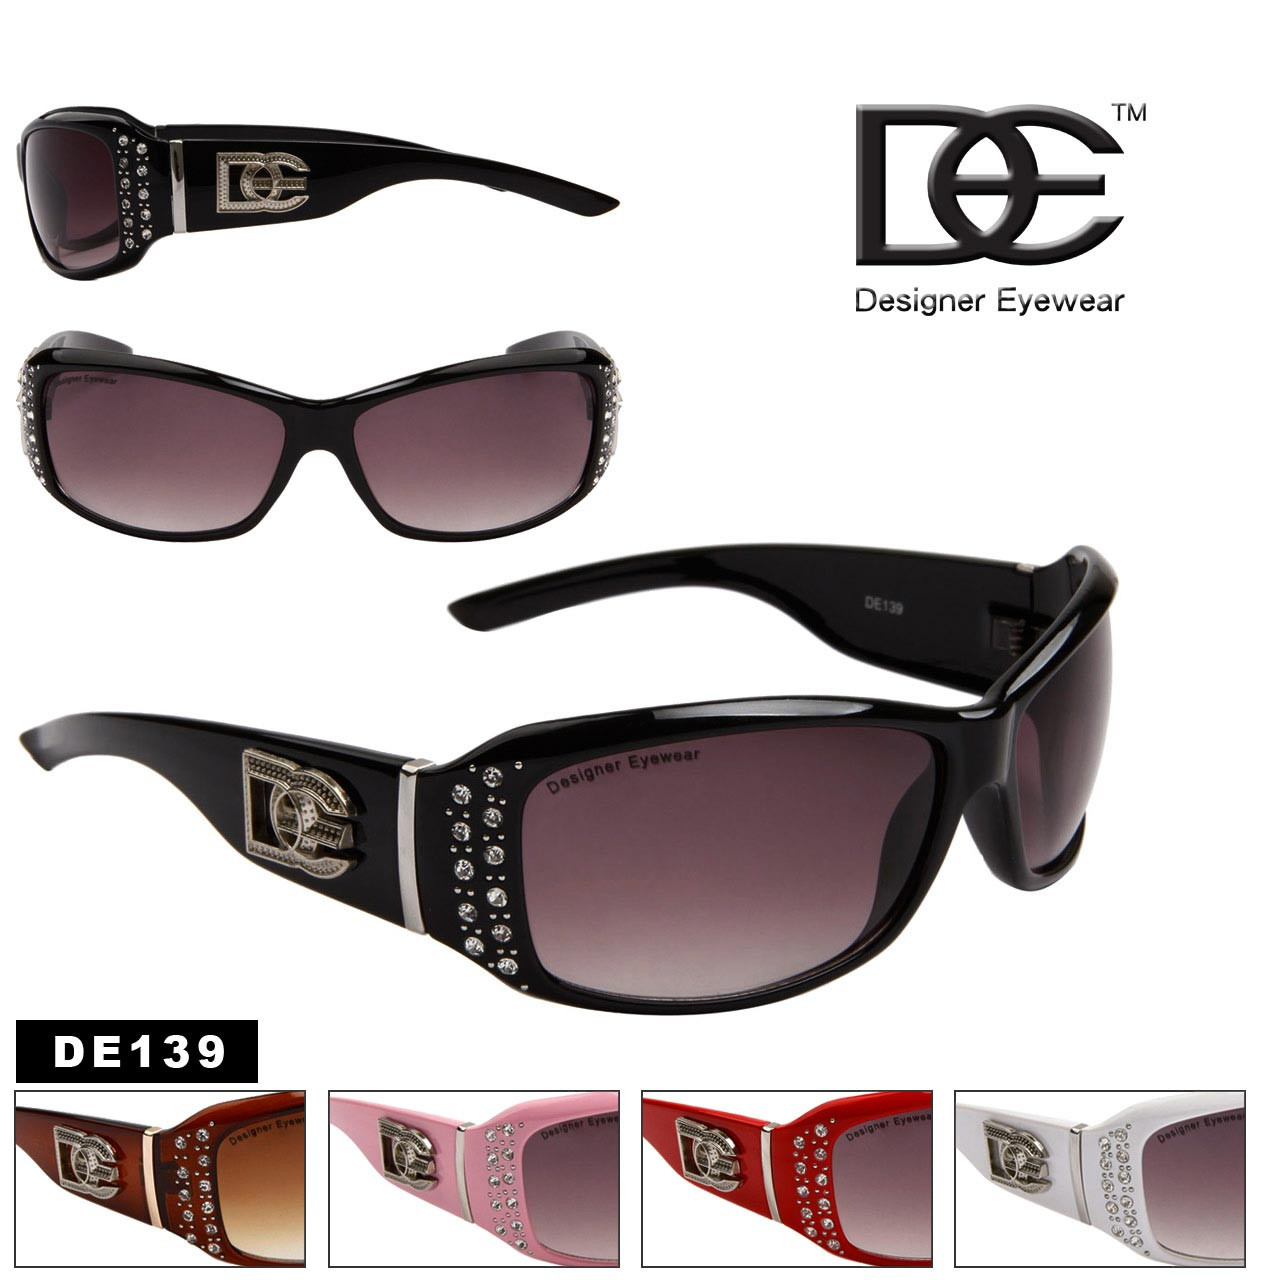 Designer Eyewear™ DE139 Rhinestone Sunglasses (Assorted Colors) (12 pcs.)